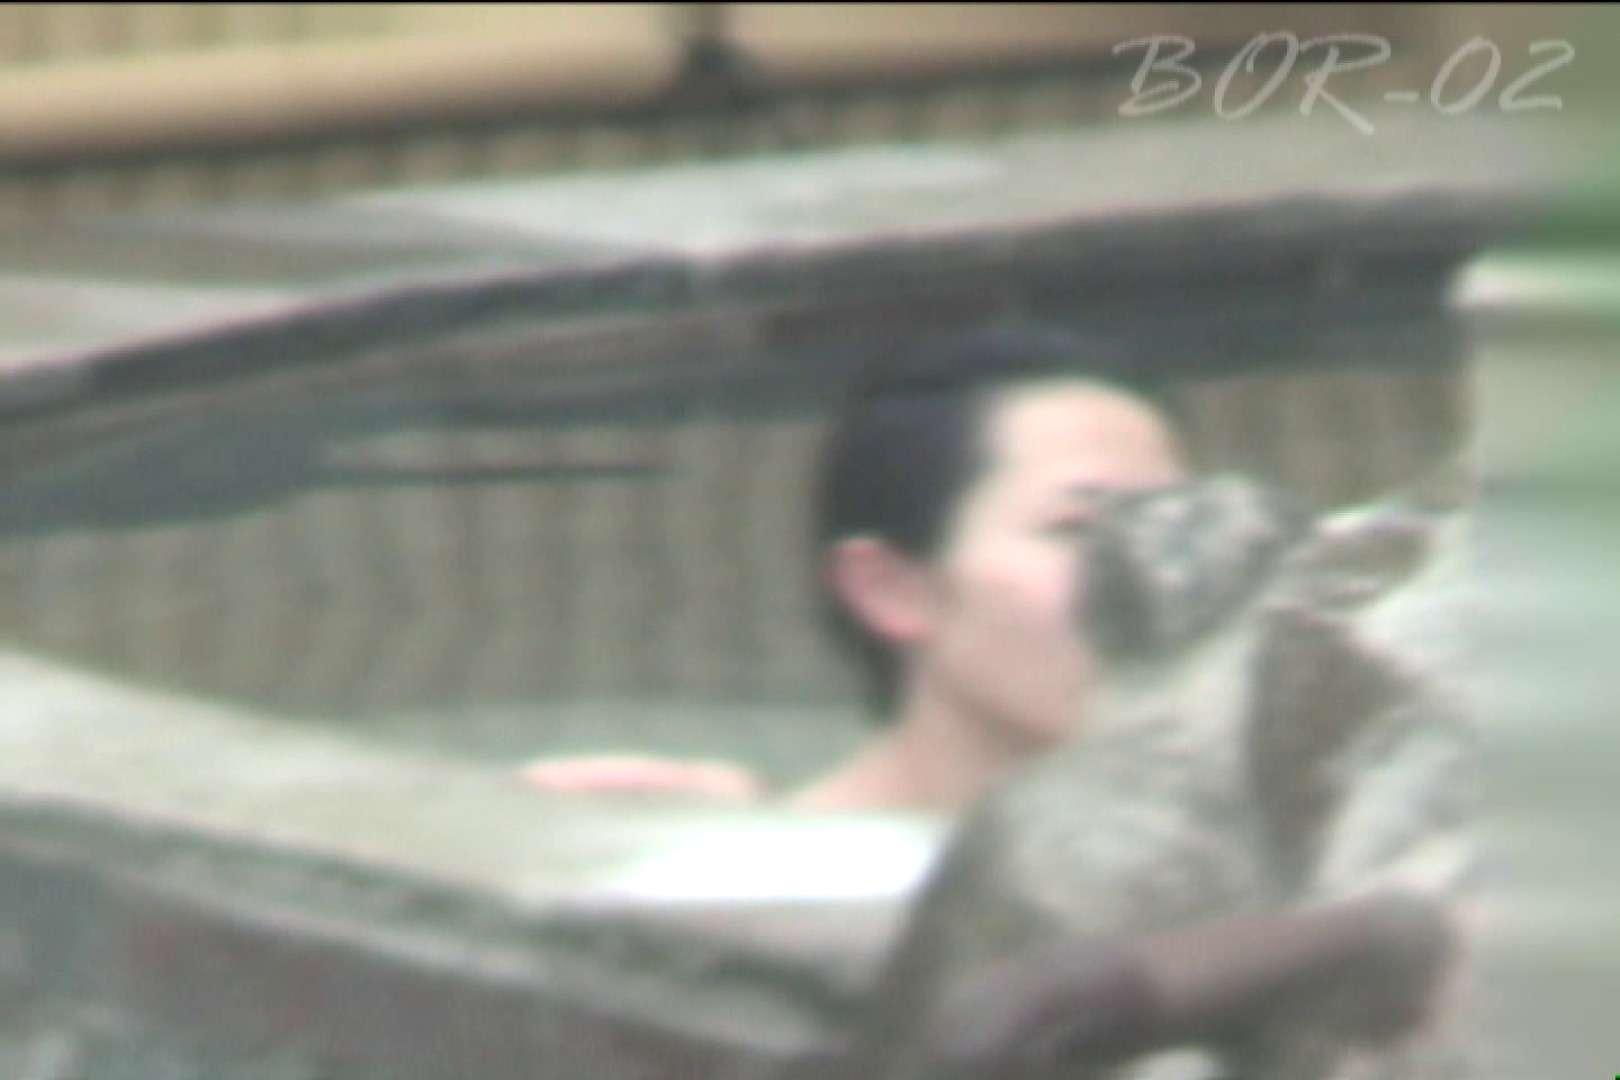 Aquaな露天風呂Vol.472 露天風呂突入 | 盗撮師作品  83pic 34